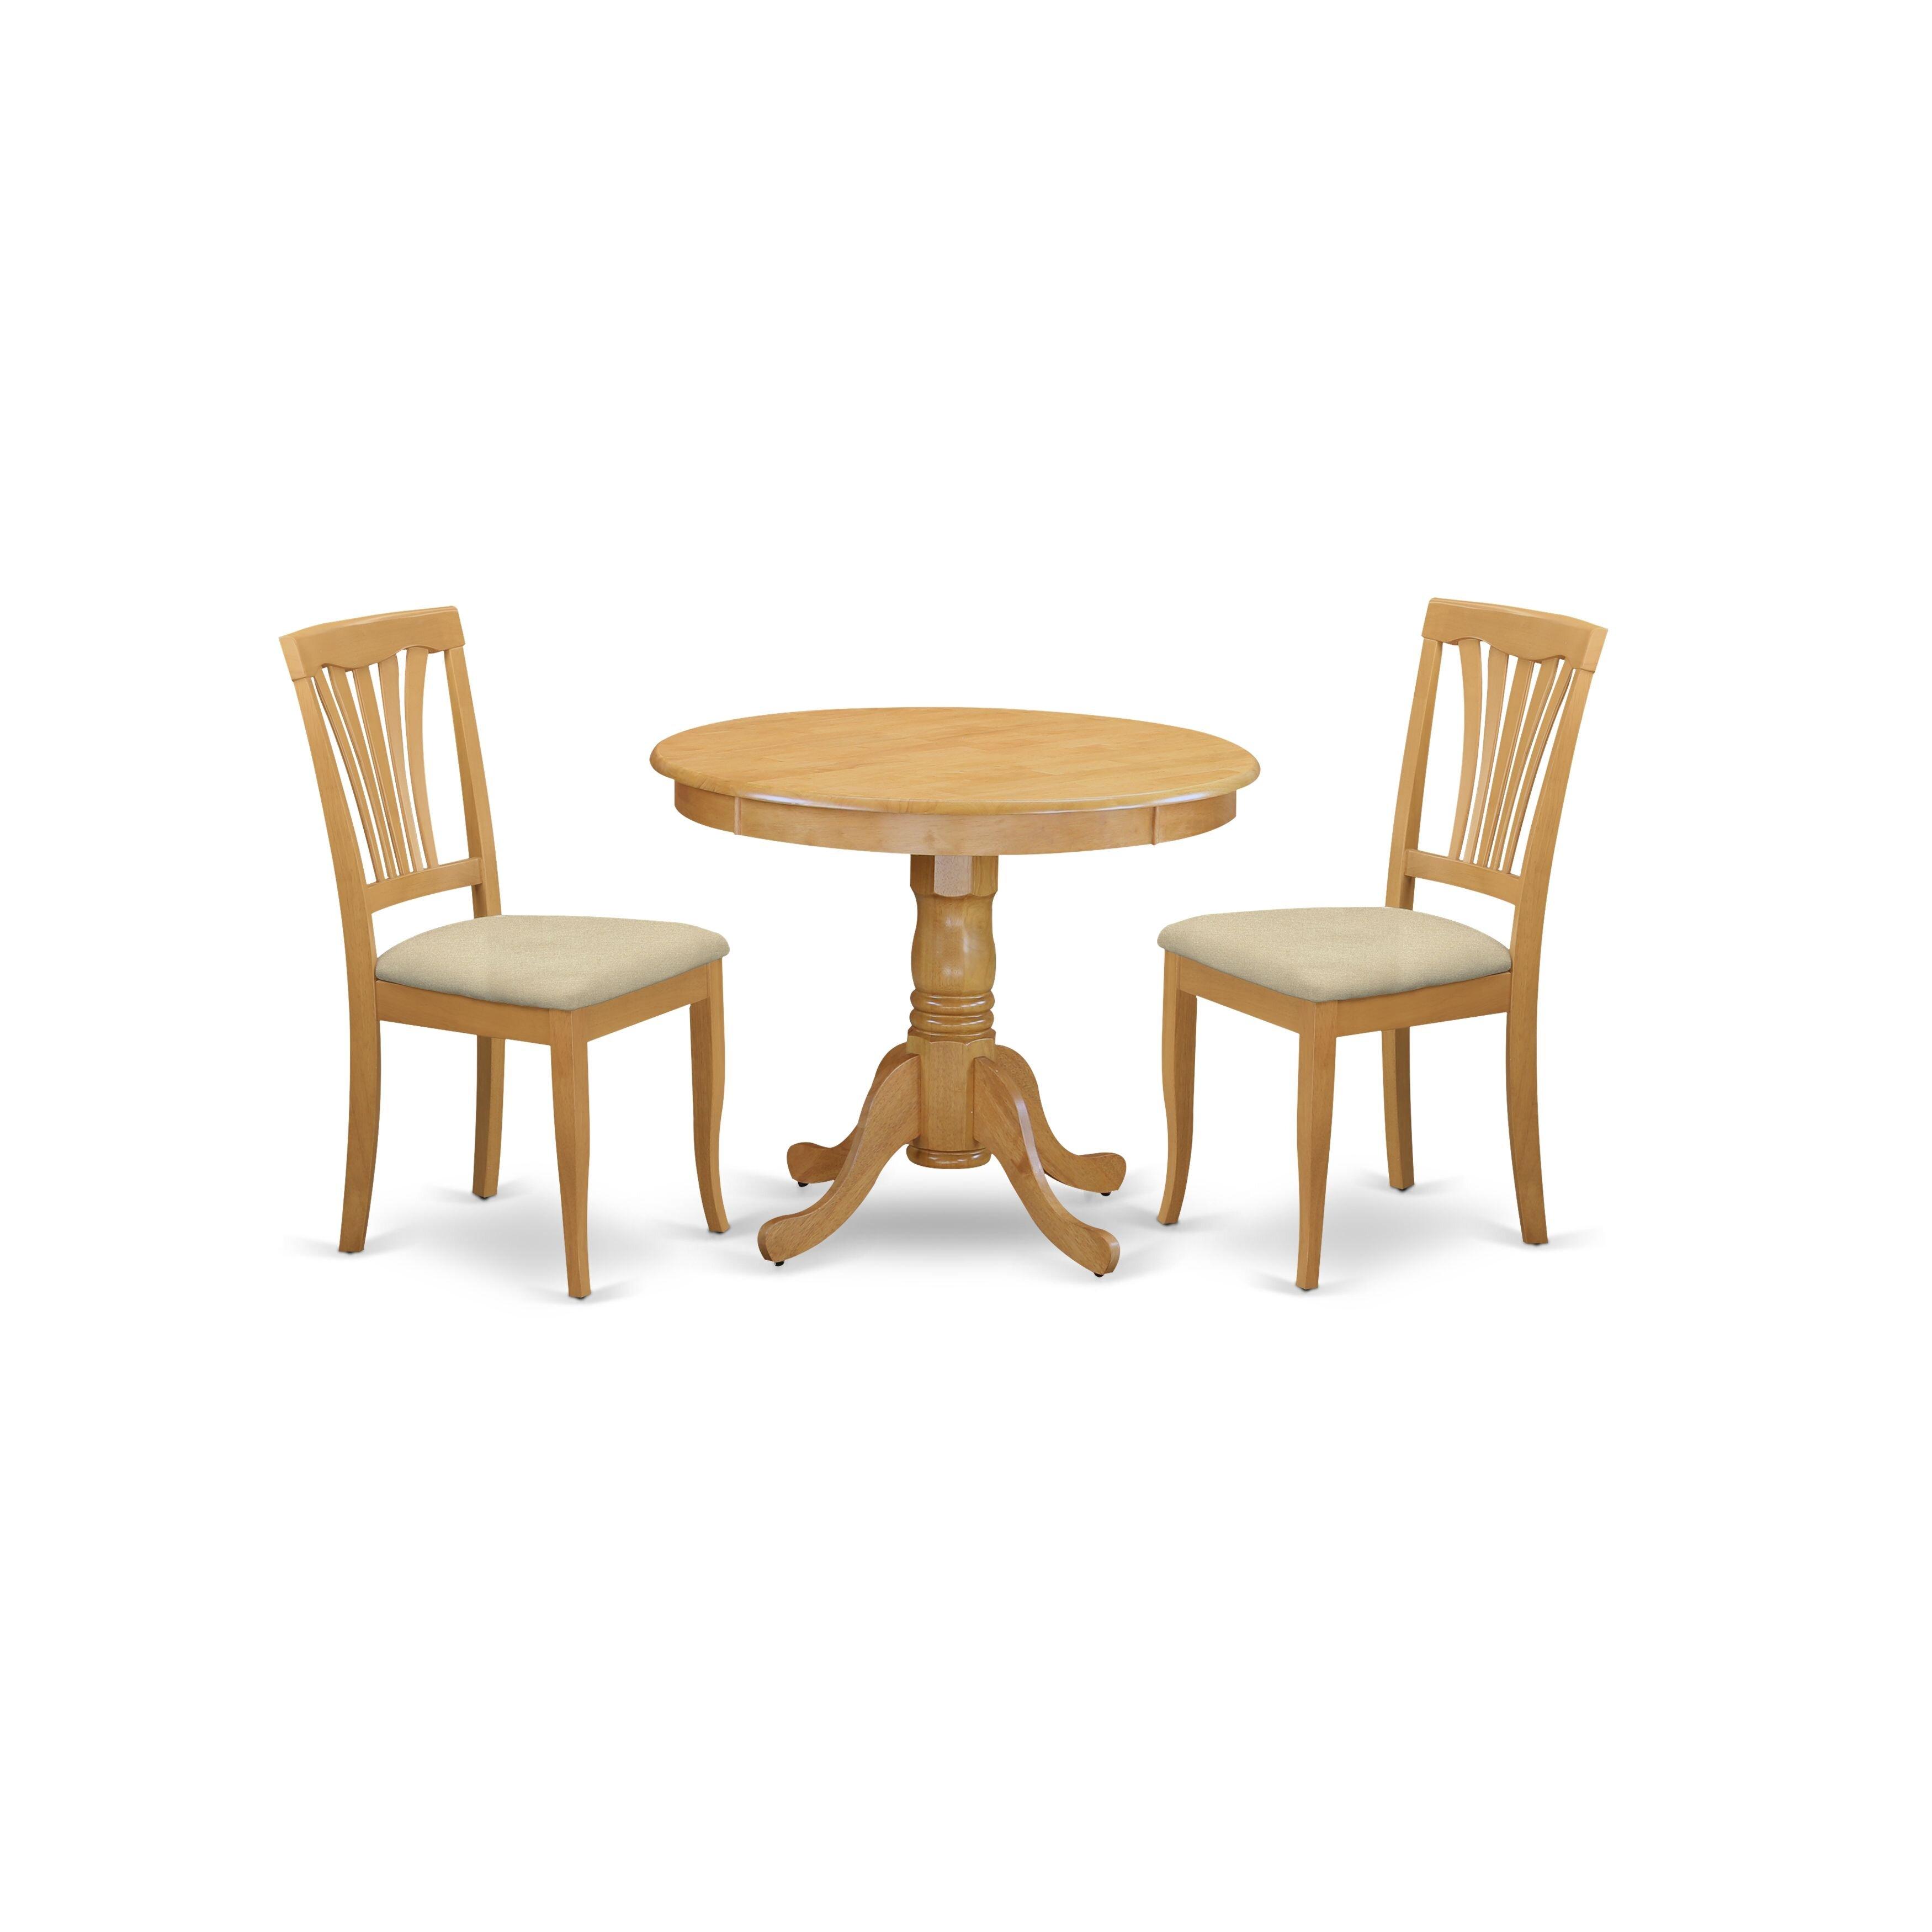 Charlton Home Stjohn 3 Piece Dining Set